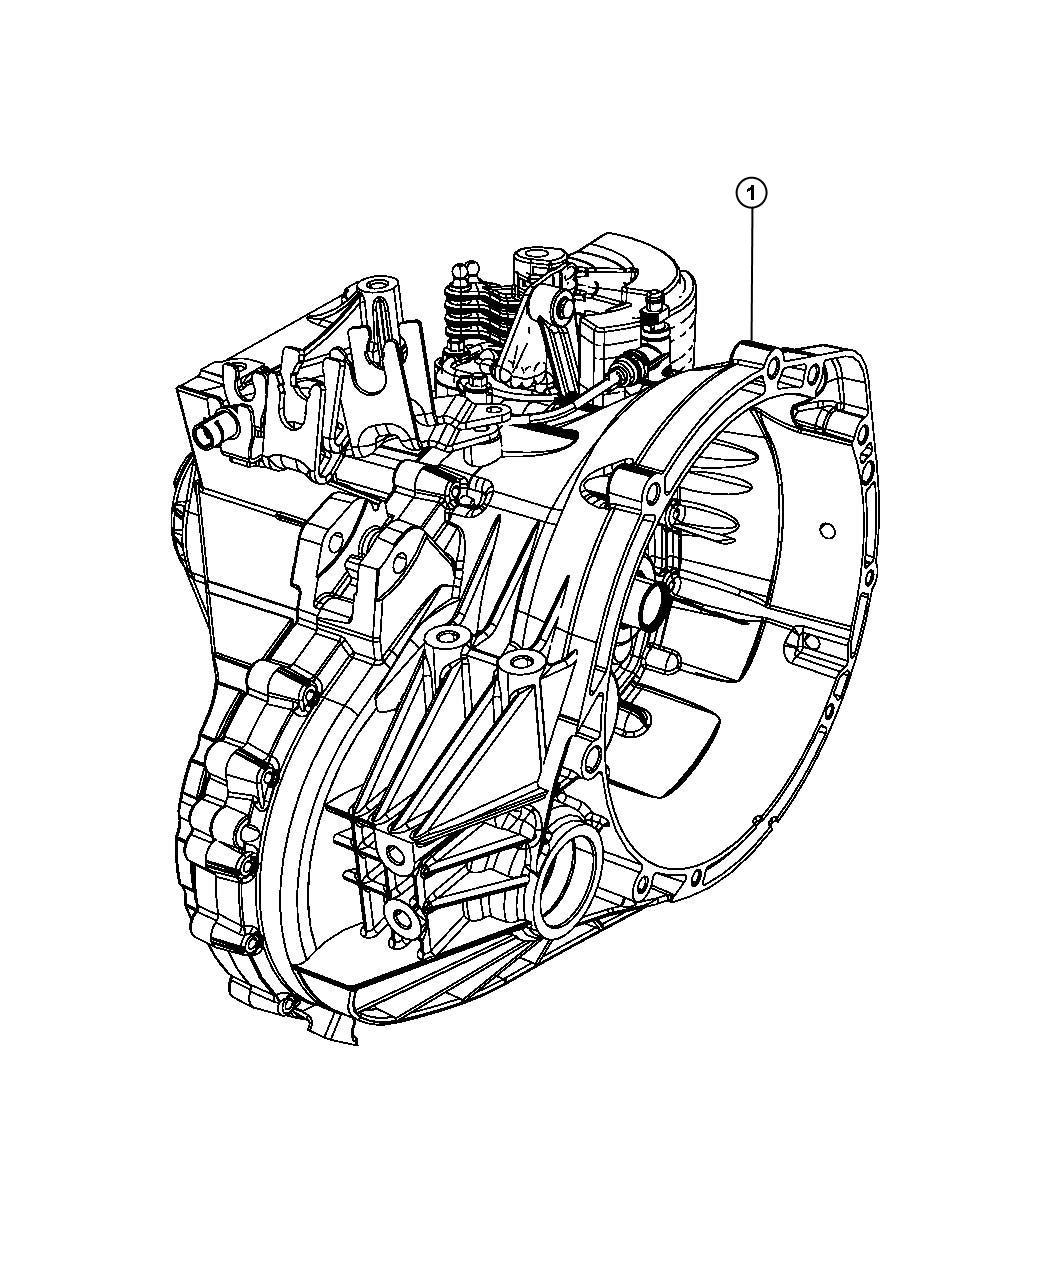 2008 Dodge Caliber Trans  Transmission  Transaxle